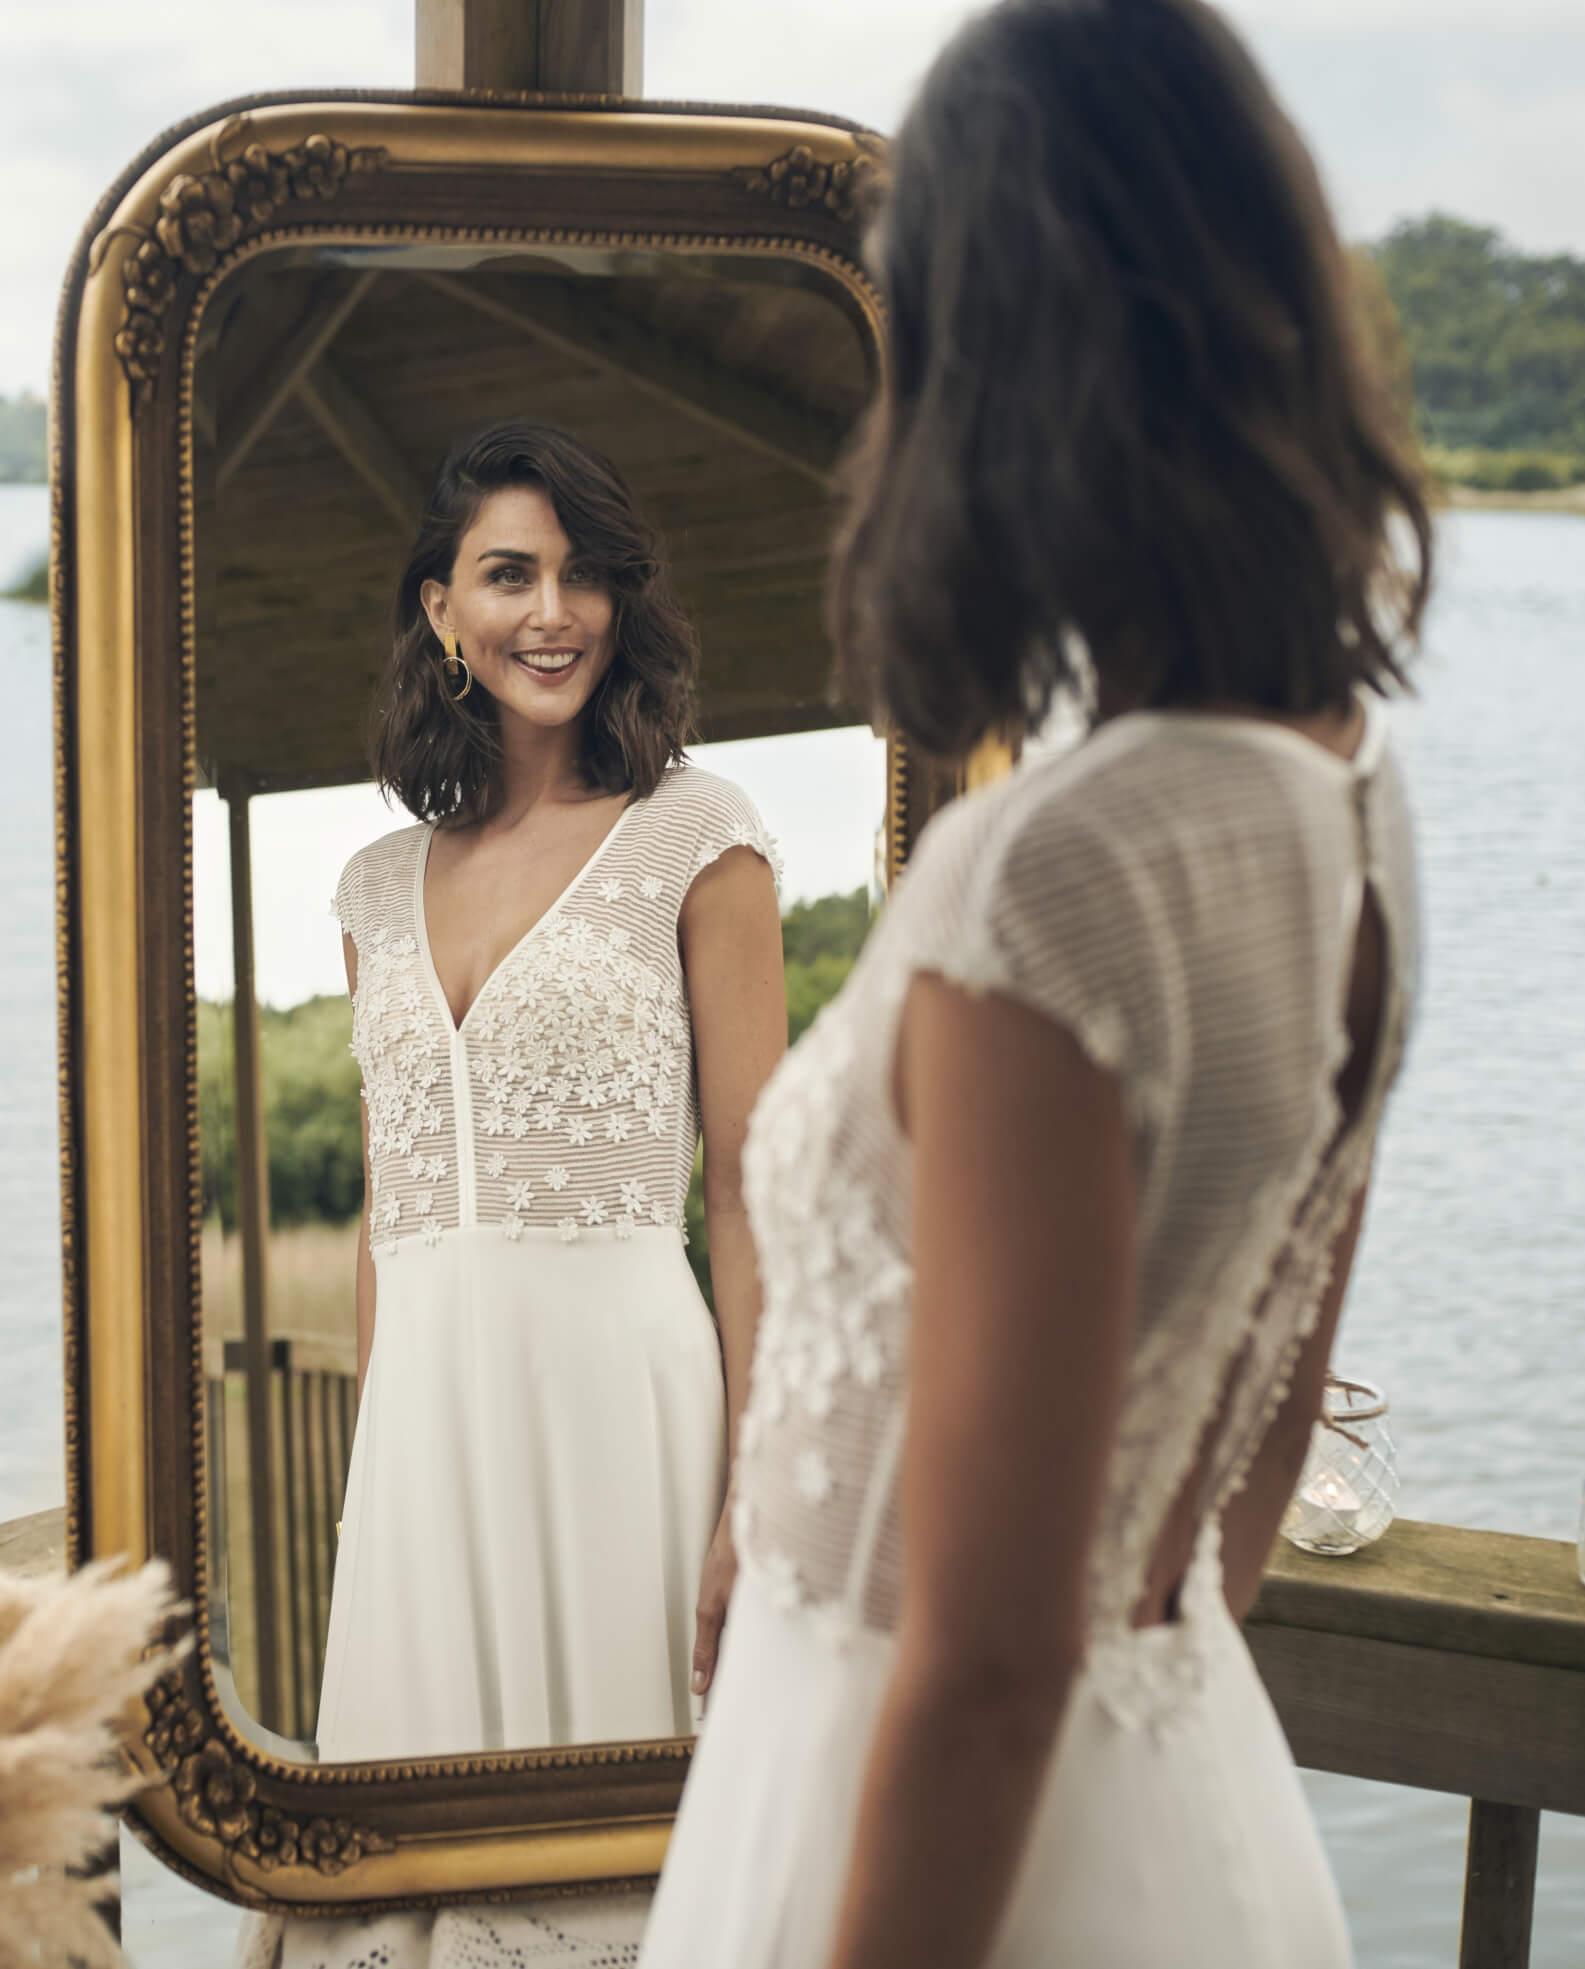 Vestidos novia bohemios valencia